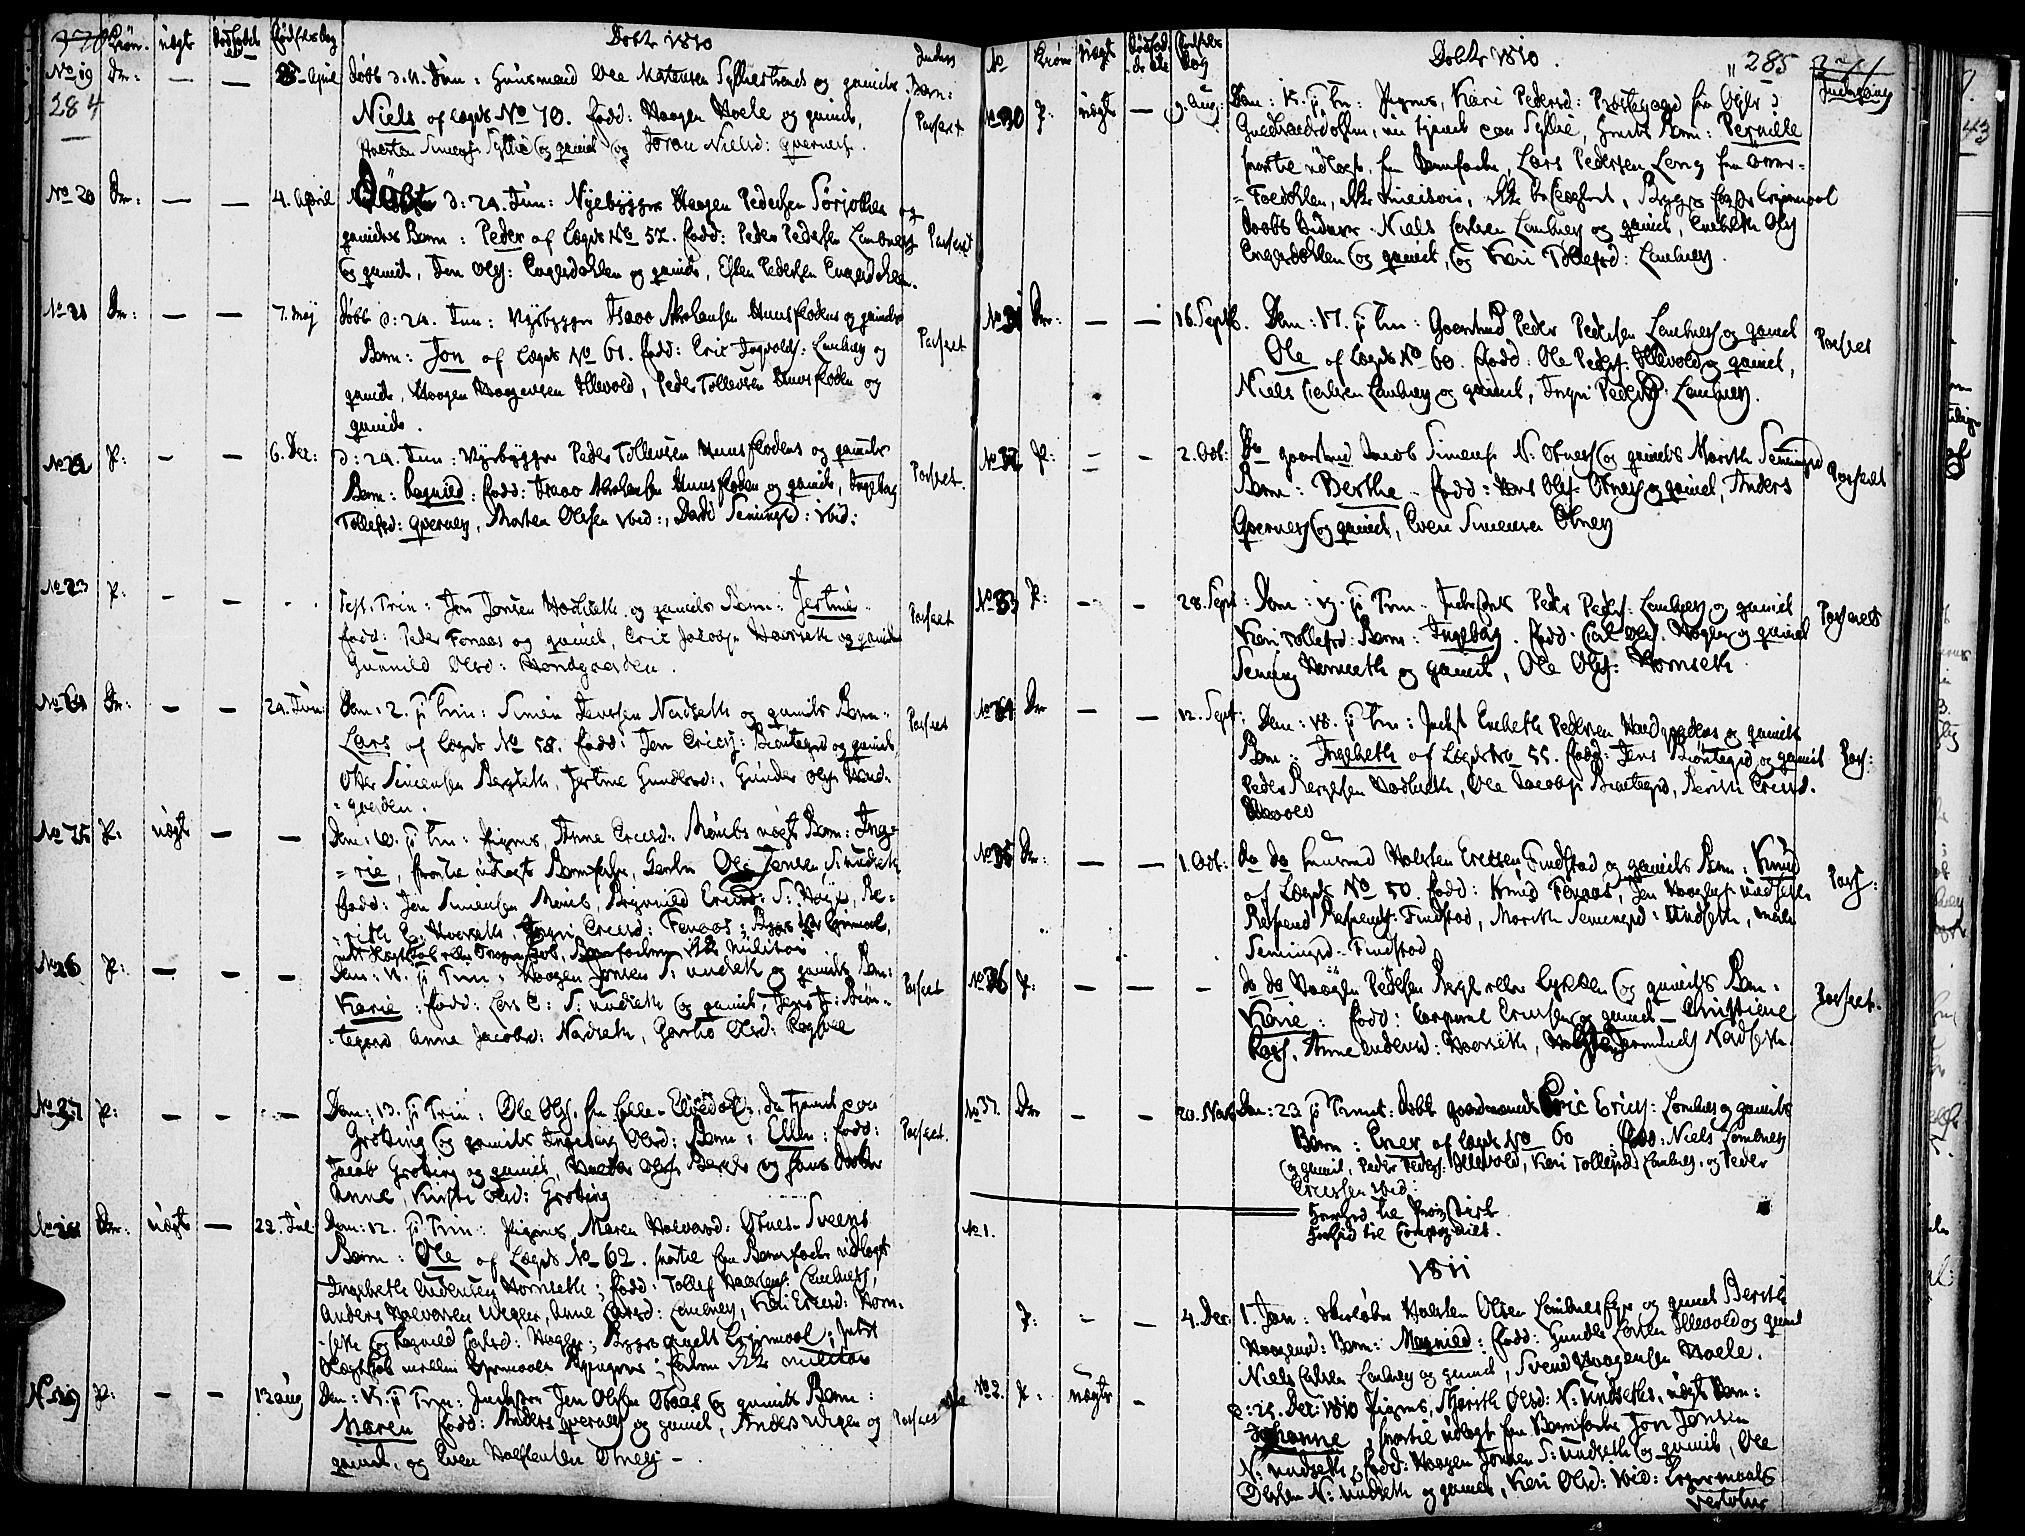 SAH, Rendalen prestekontor, H/Ha/Haa/L0002: Ministerialbok nr. 2, 1788-1814, s. 284-285